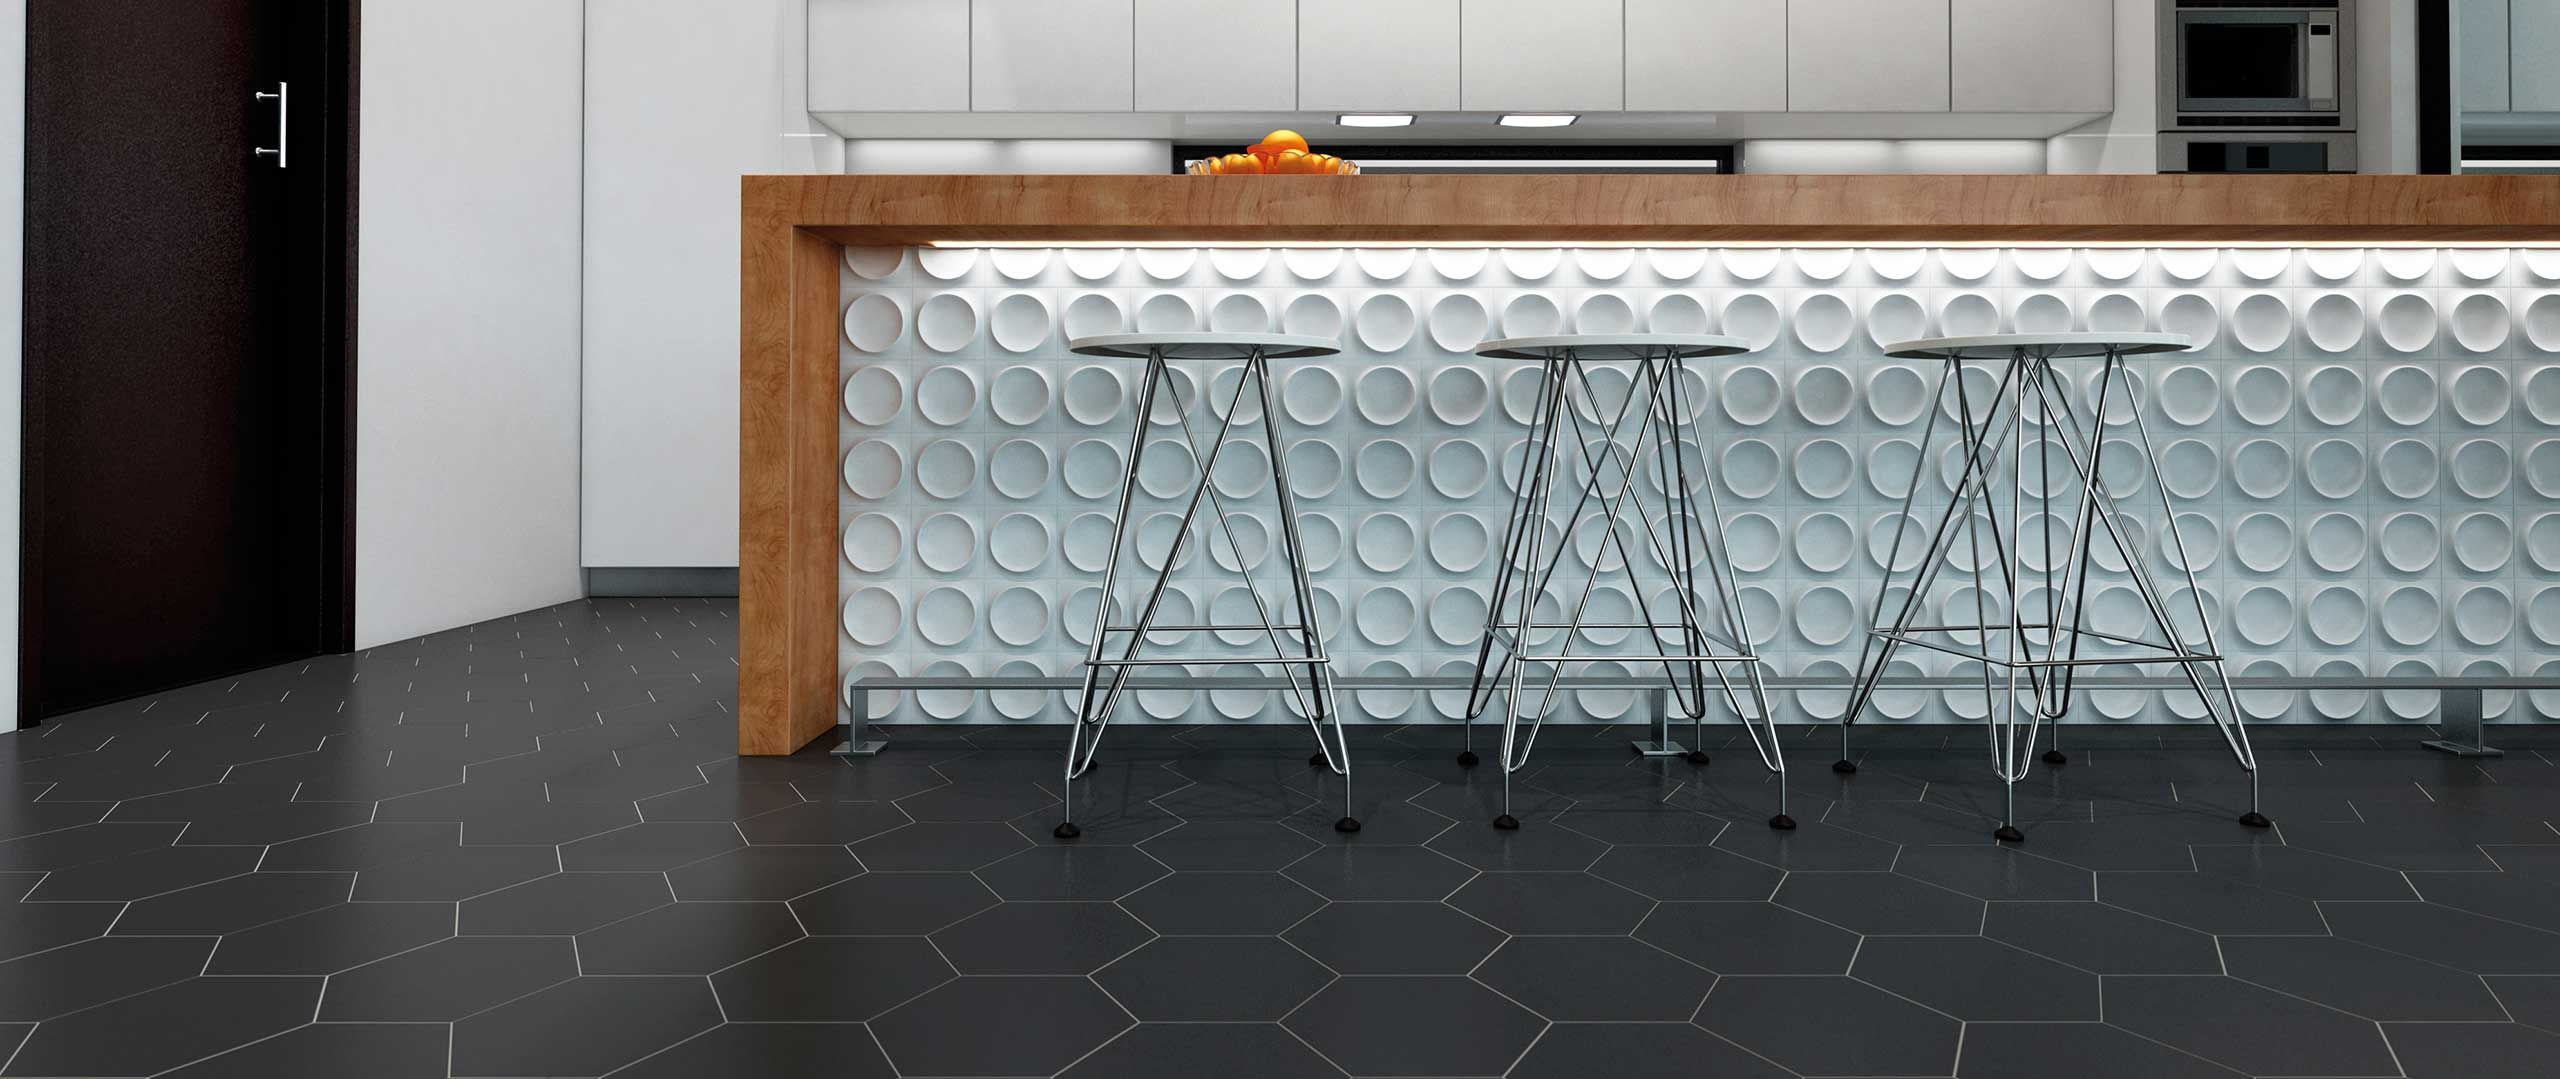 Pin by BERGERSEN FLIS on WOW design | Pinterest | 3d tiles, Studio ...